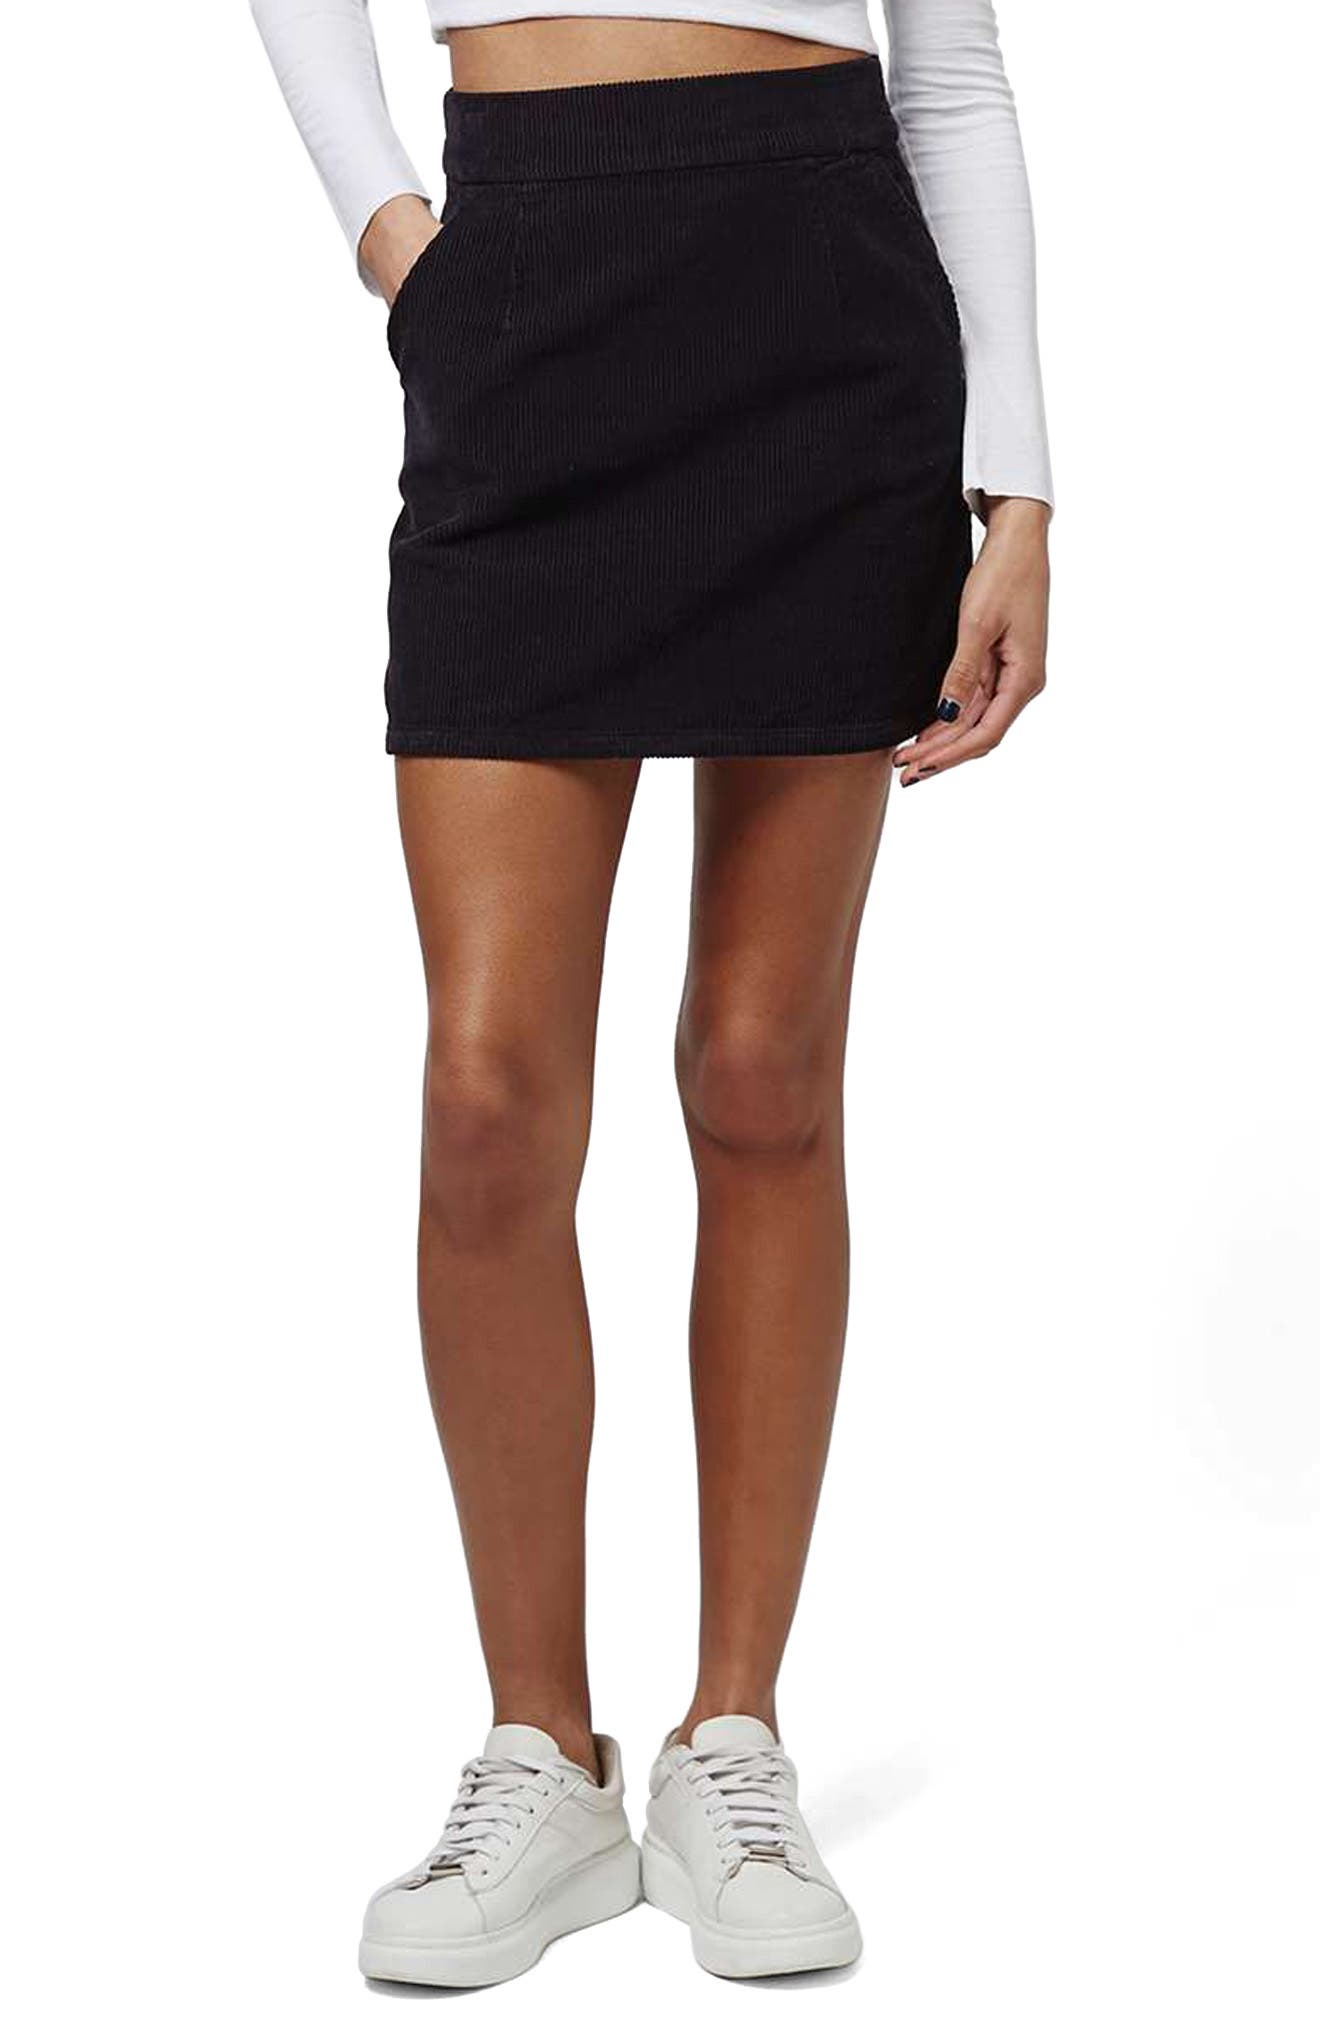 Alternate Image 1 Selected - Topshop Corduroy Miniskirt